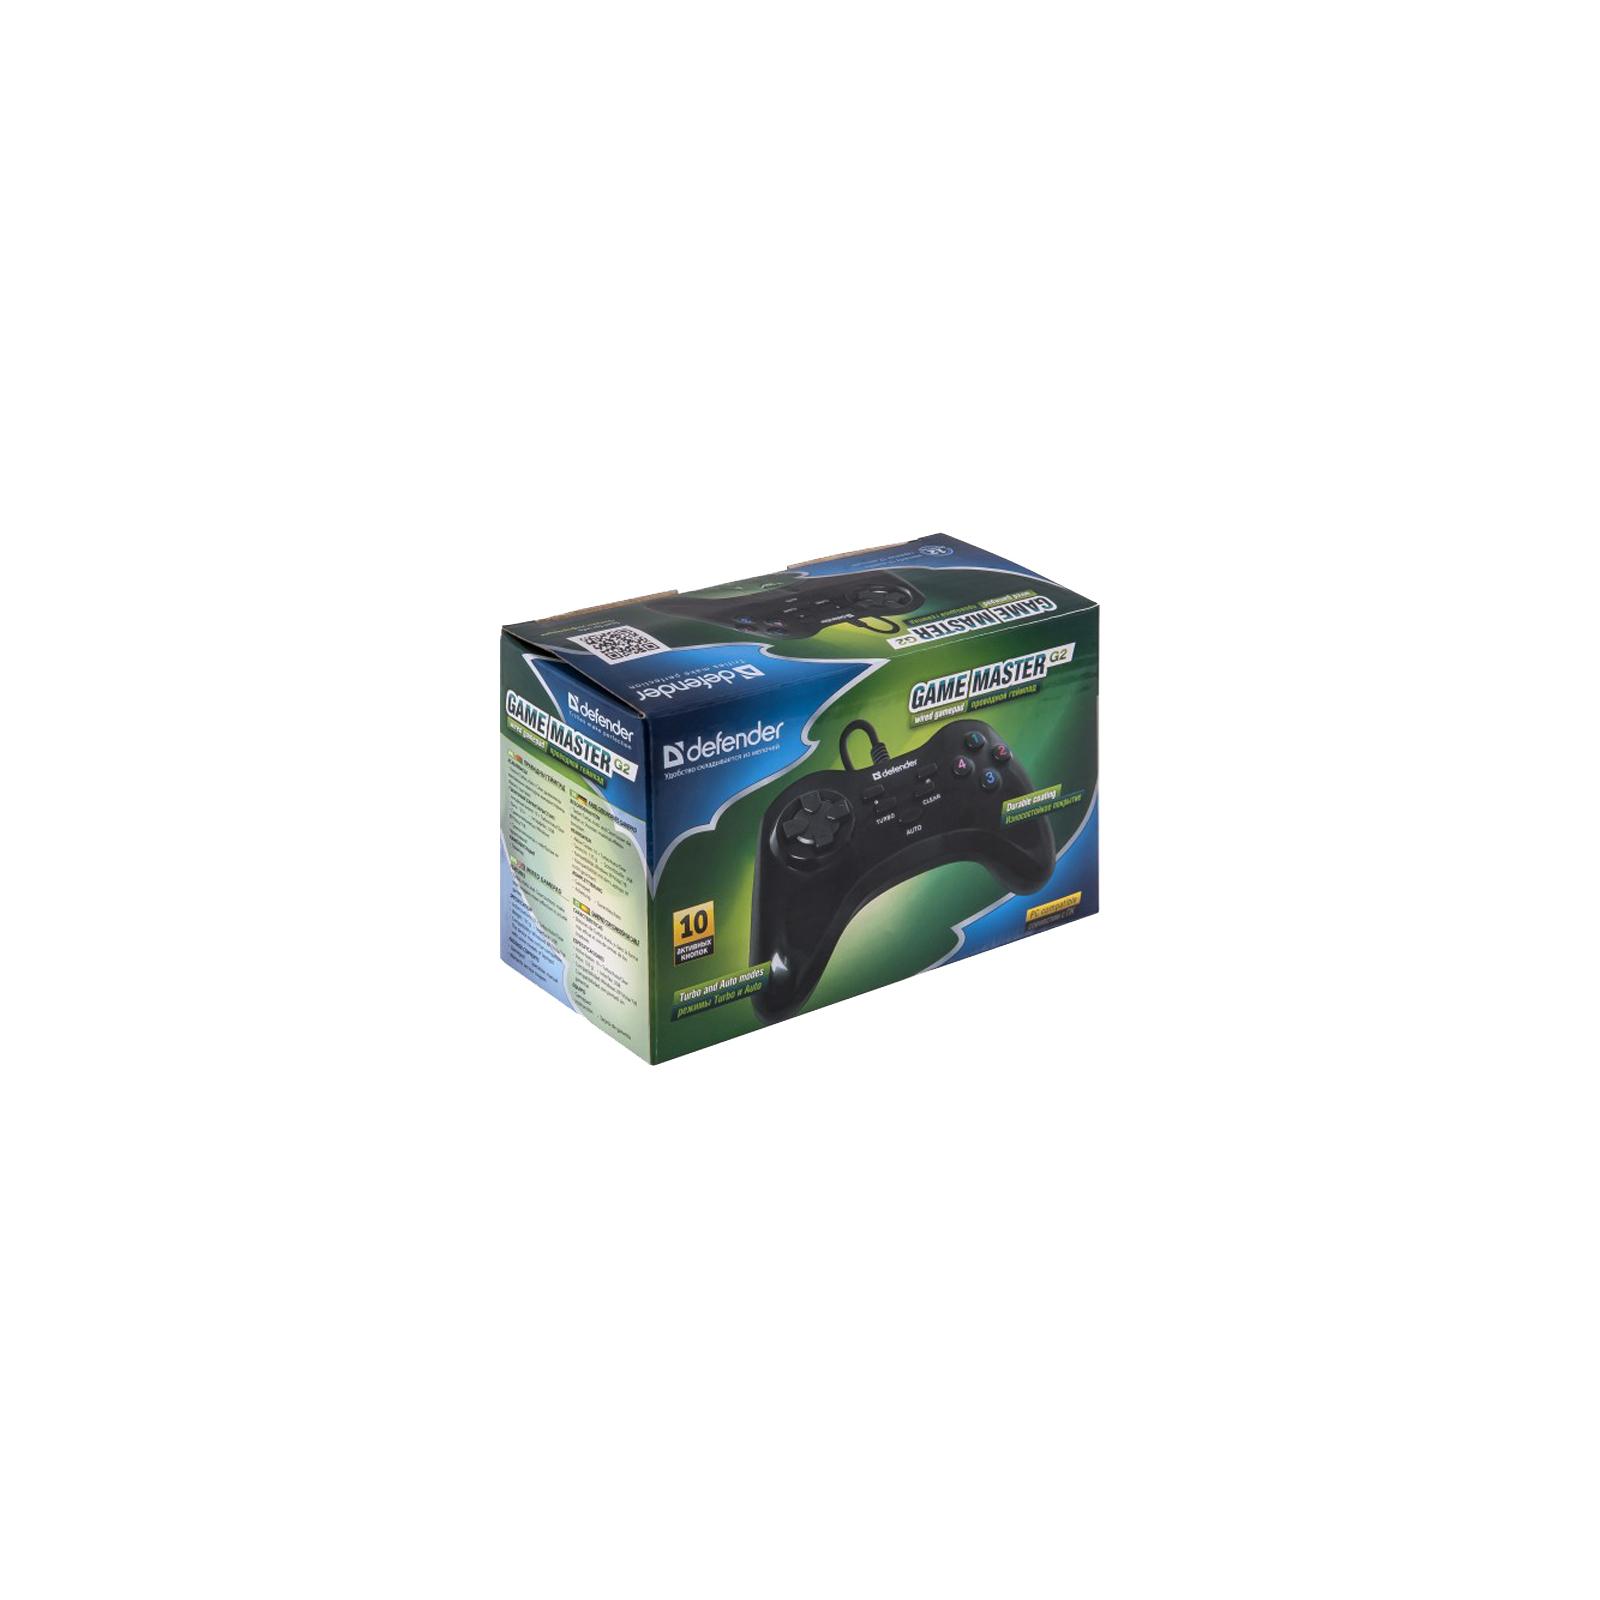 Геймпад Defender Game Master G2 (64258) изображение 4